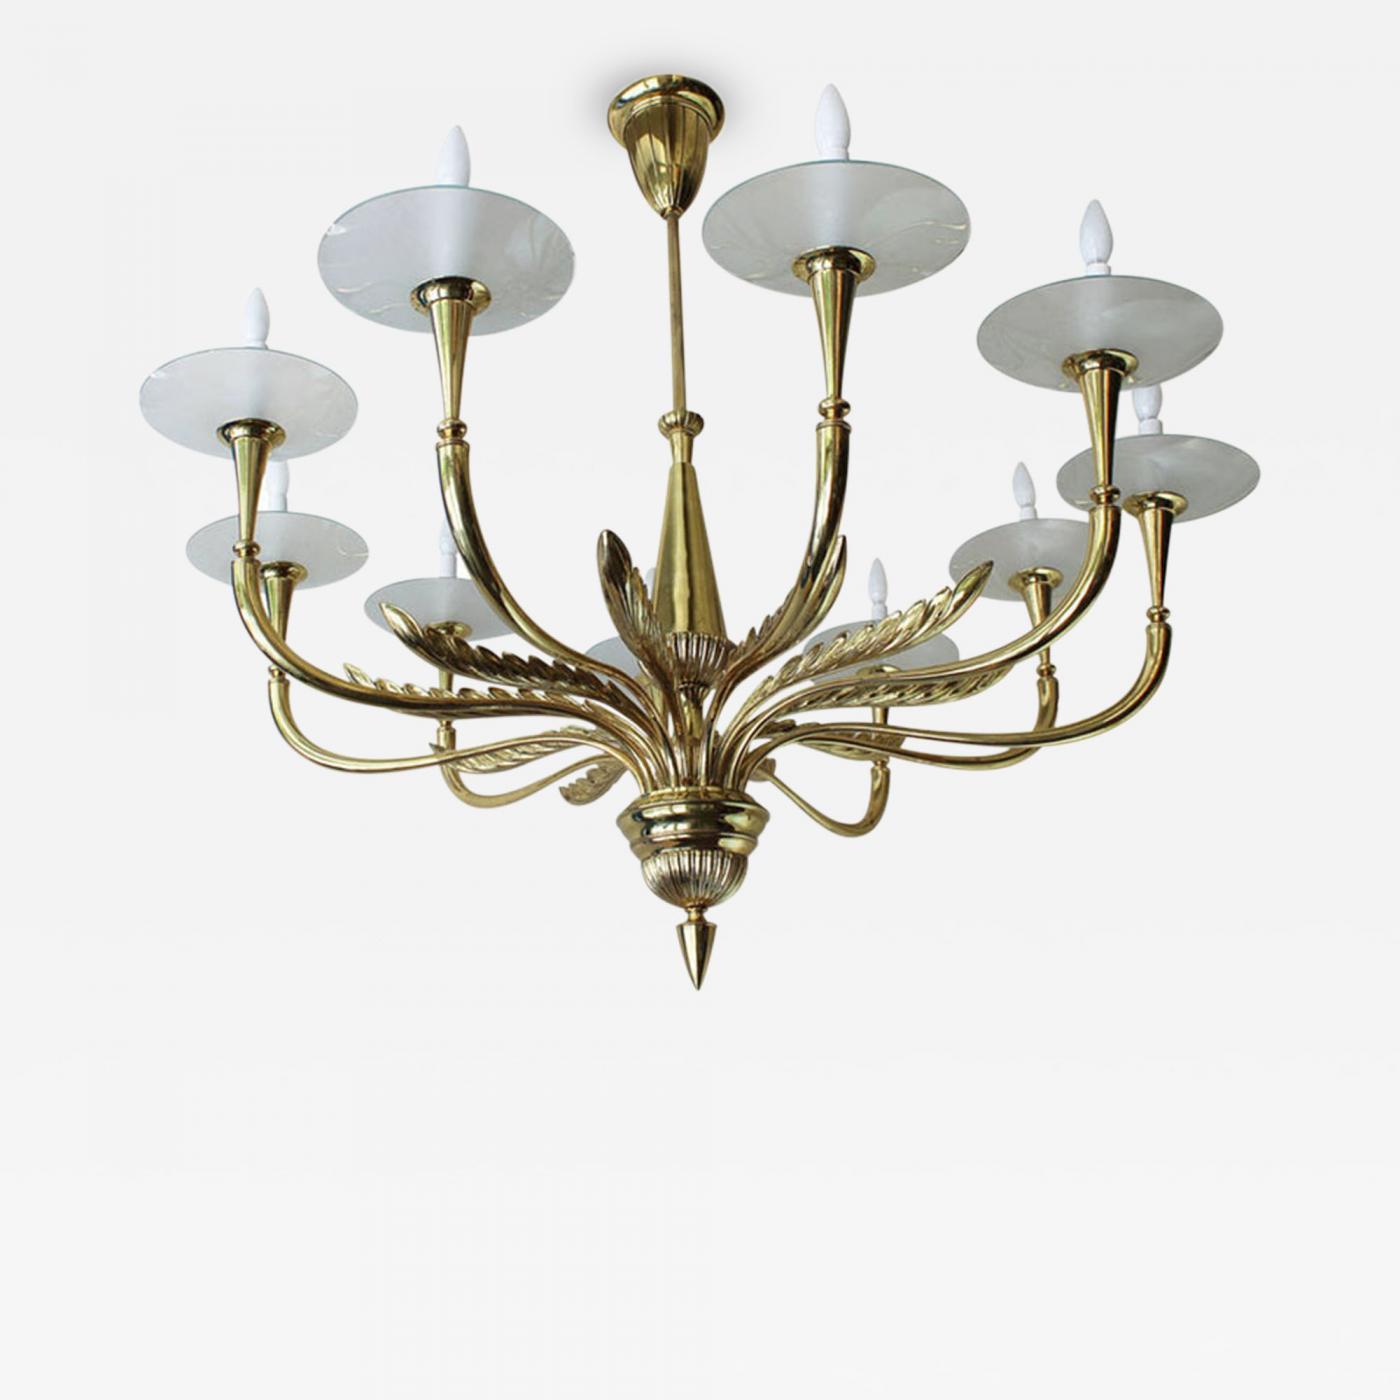 Massive italian regency chandelier listings furniture lighting chandeliers and pendants massive italian regency chandelier mozeypictures Gallery